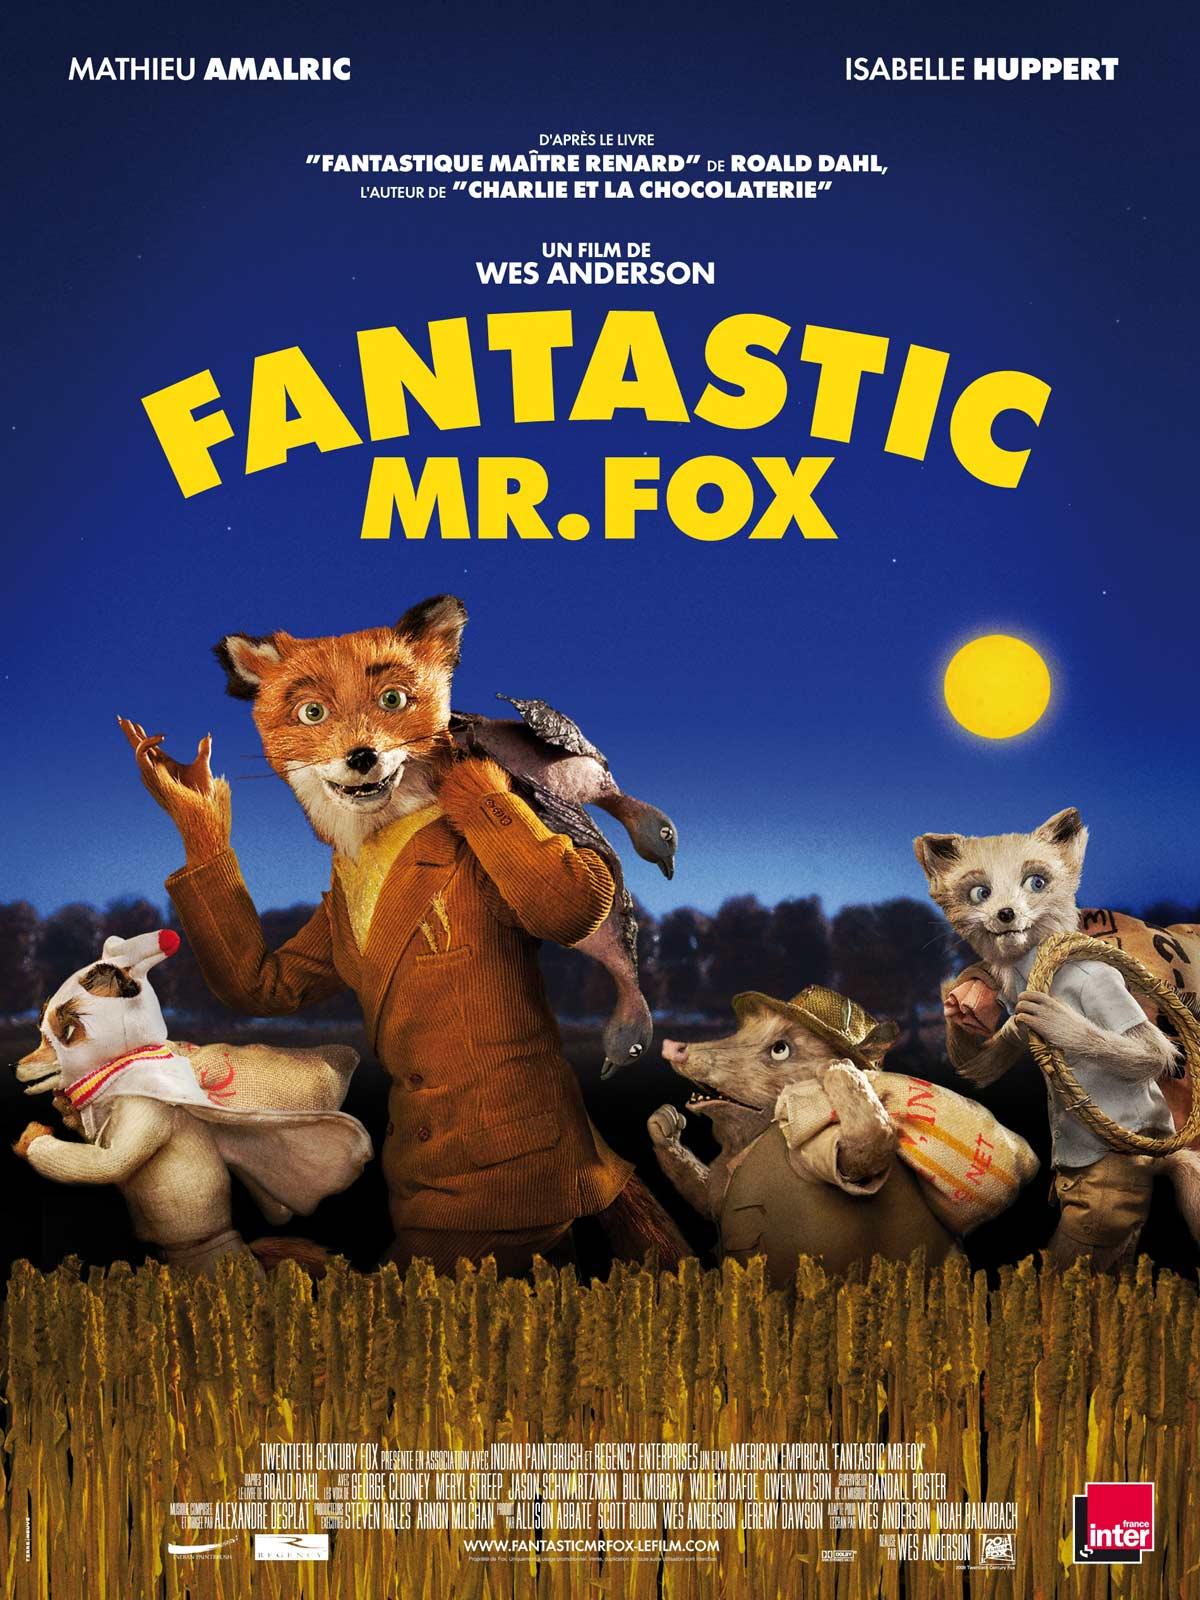 Fantastic M.fox